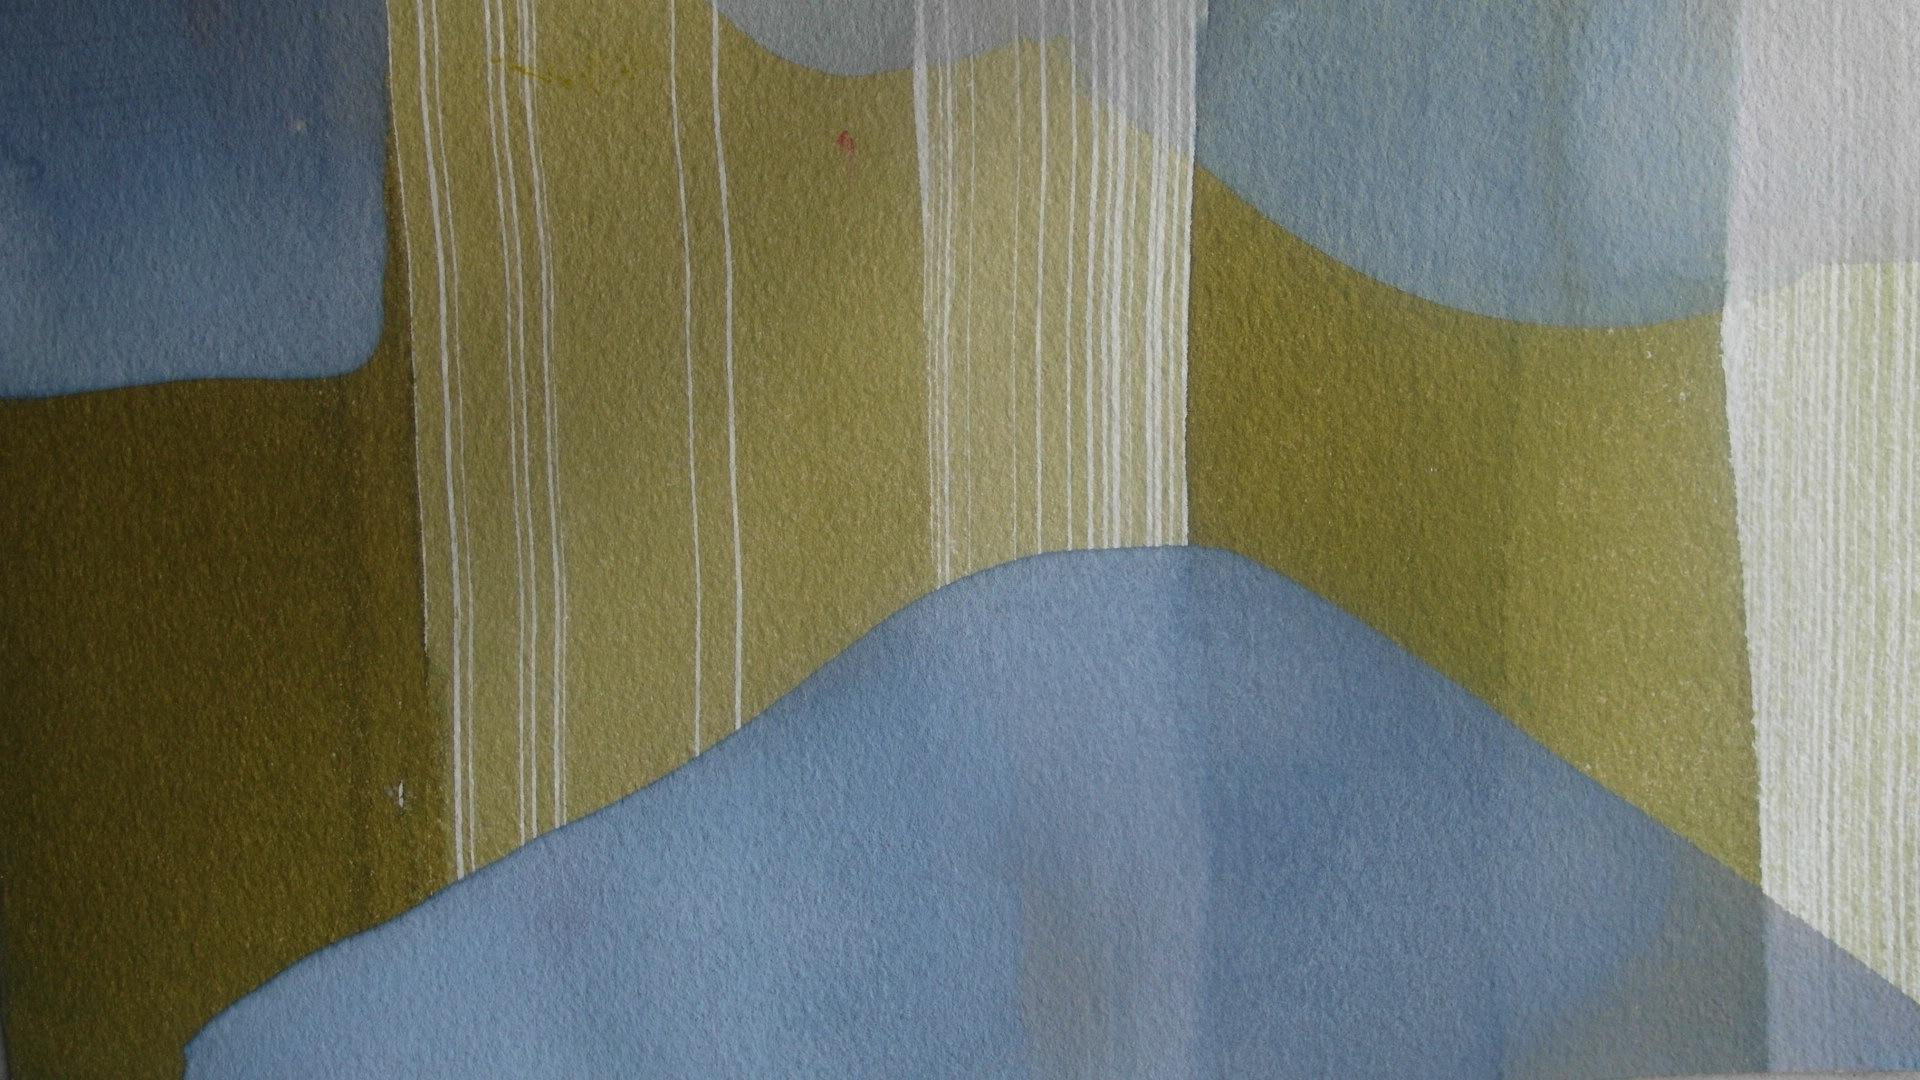 Teresa Muñiz Teresa Muñiz. Acuarela s/ papel Fabriano 22,5 cm x 14,5 cm 2008